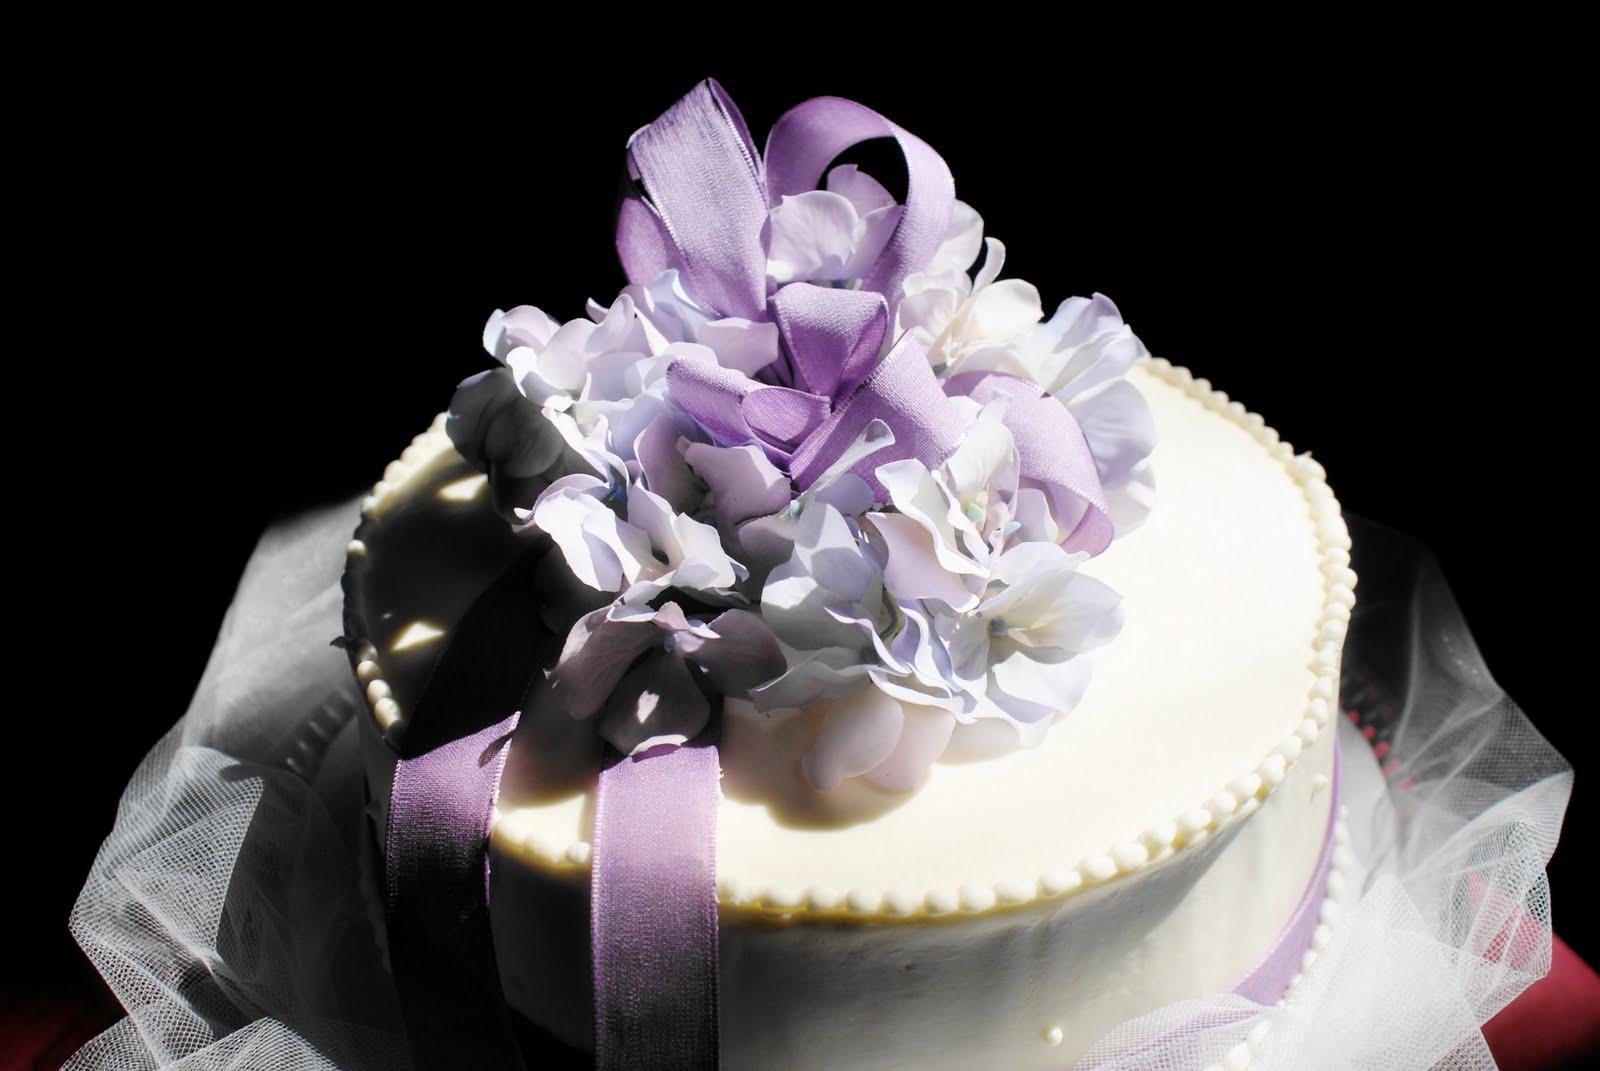 She made my own wedding cake